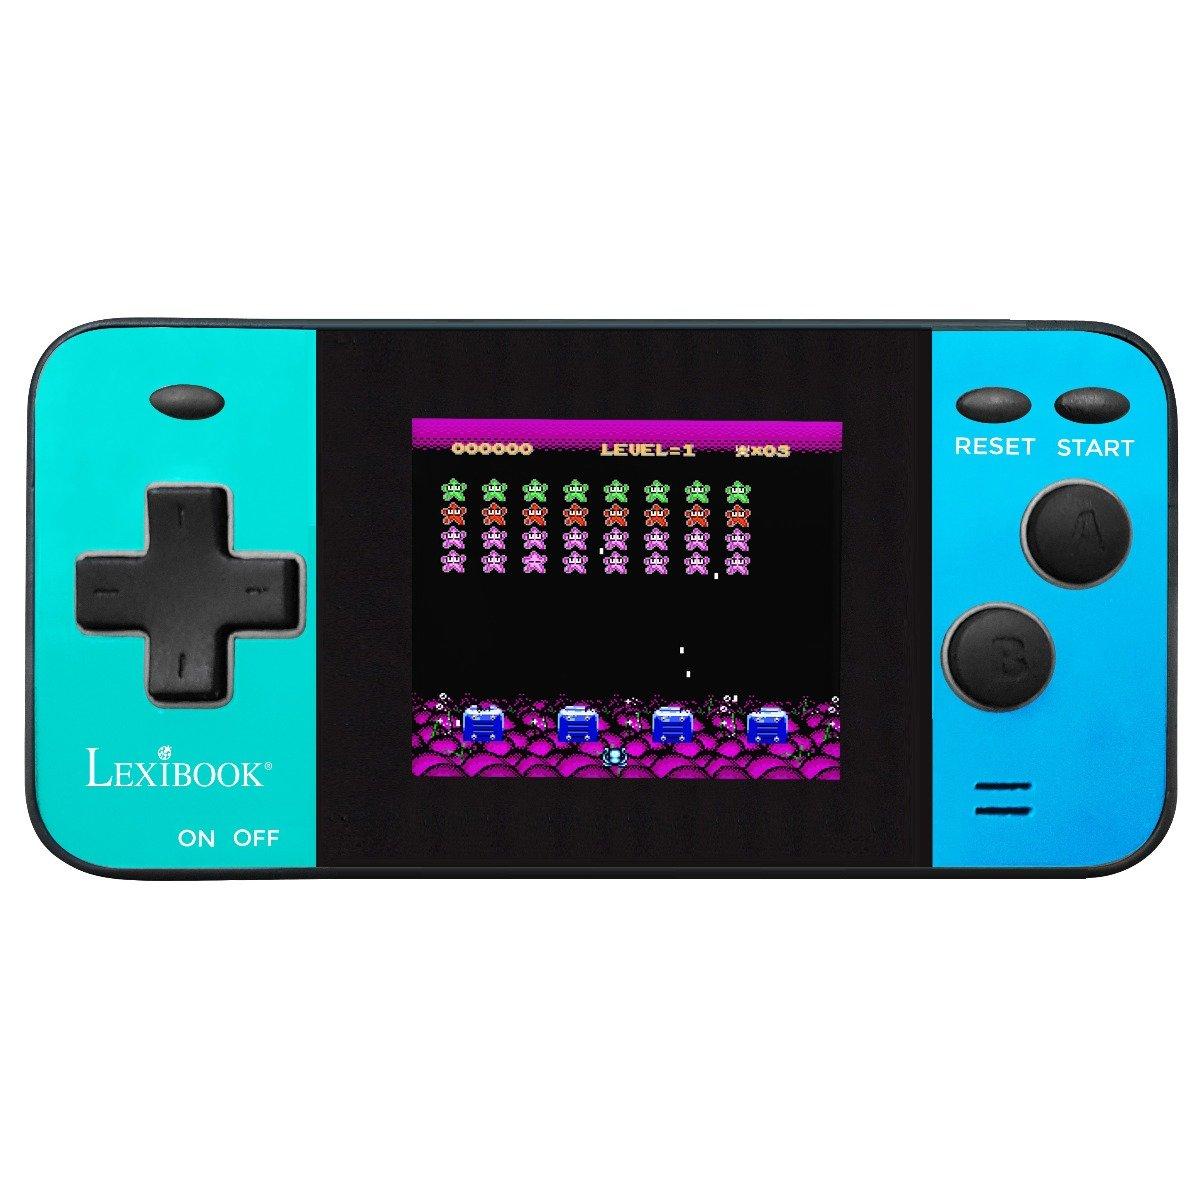 Consola portabila mini Cyber Arcade Lexibook, 8 jocuri